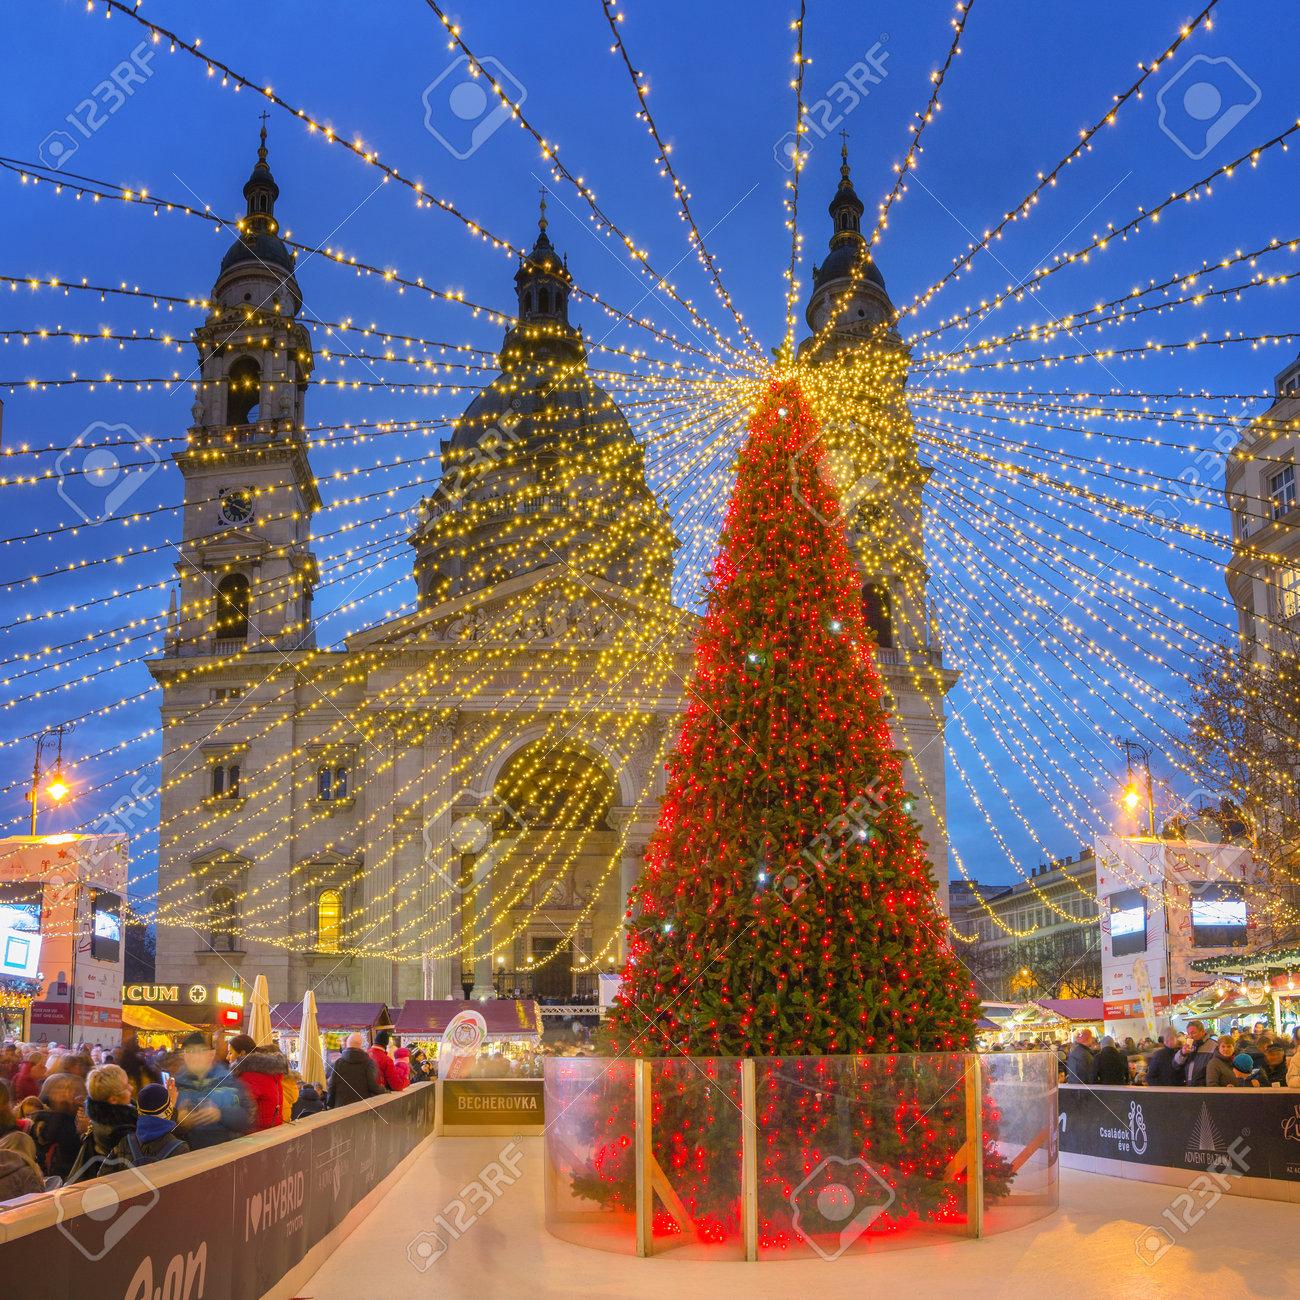 Budapest Christmas Market 2018.Budapest Hungary December 08 2018 Christmas Market At Saint